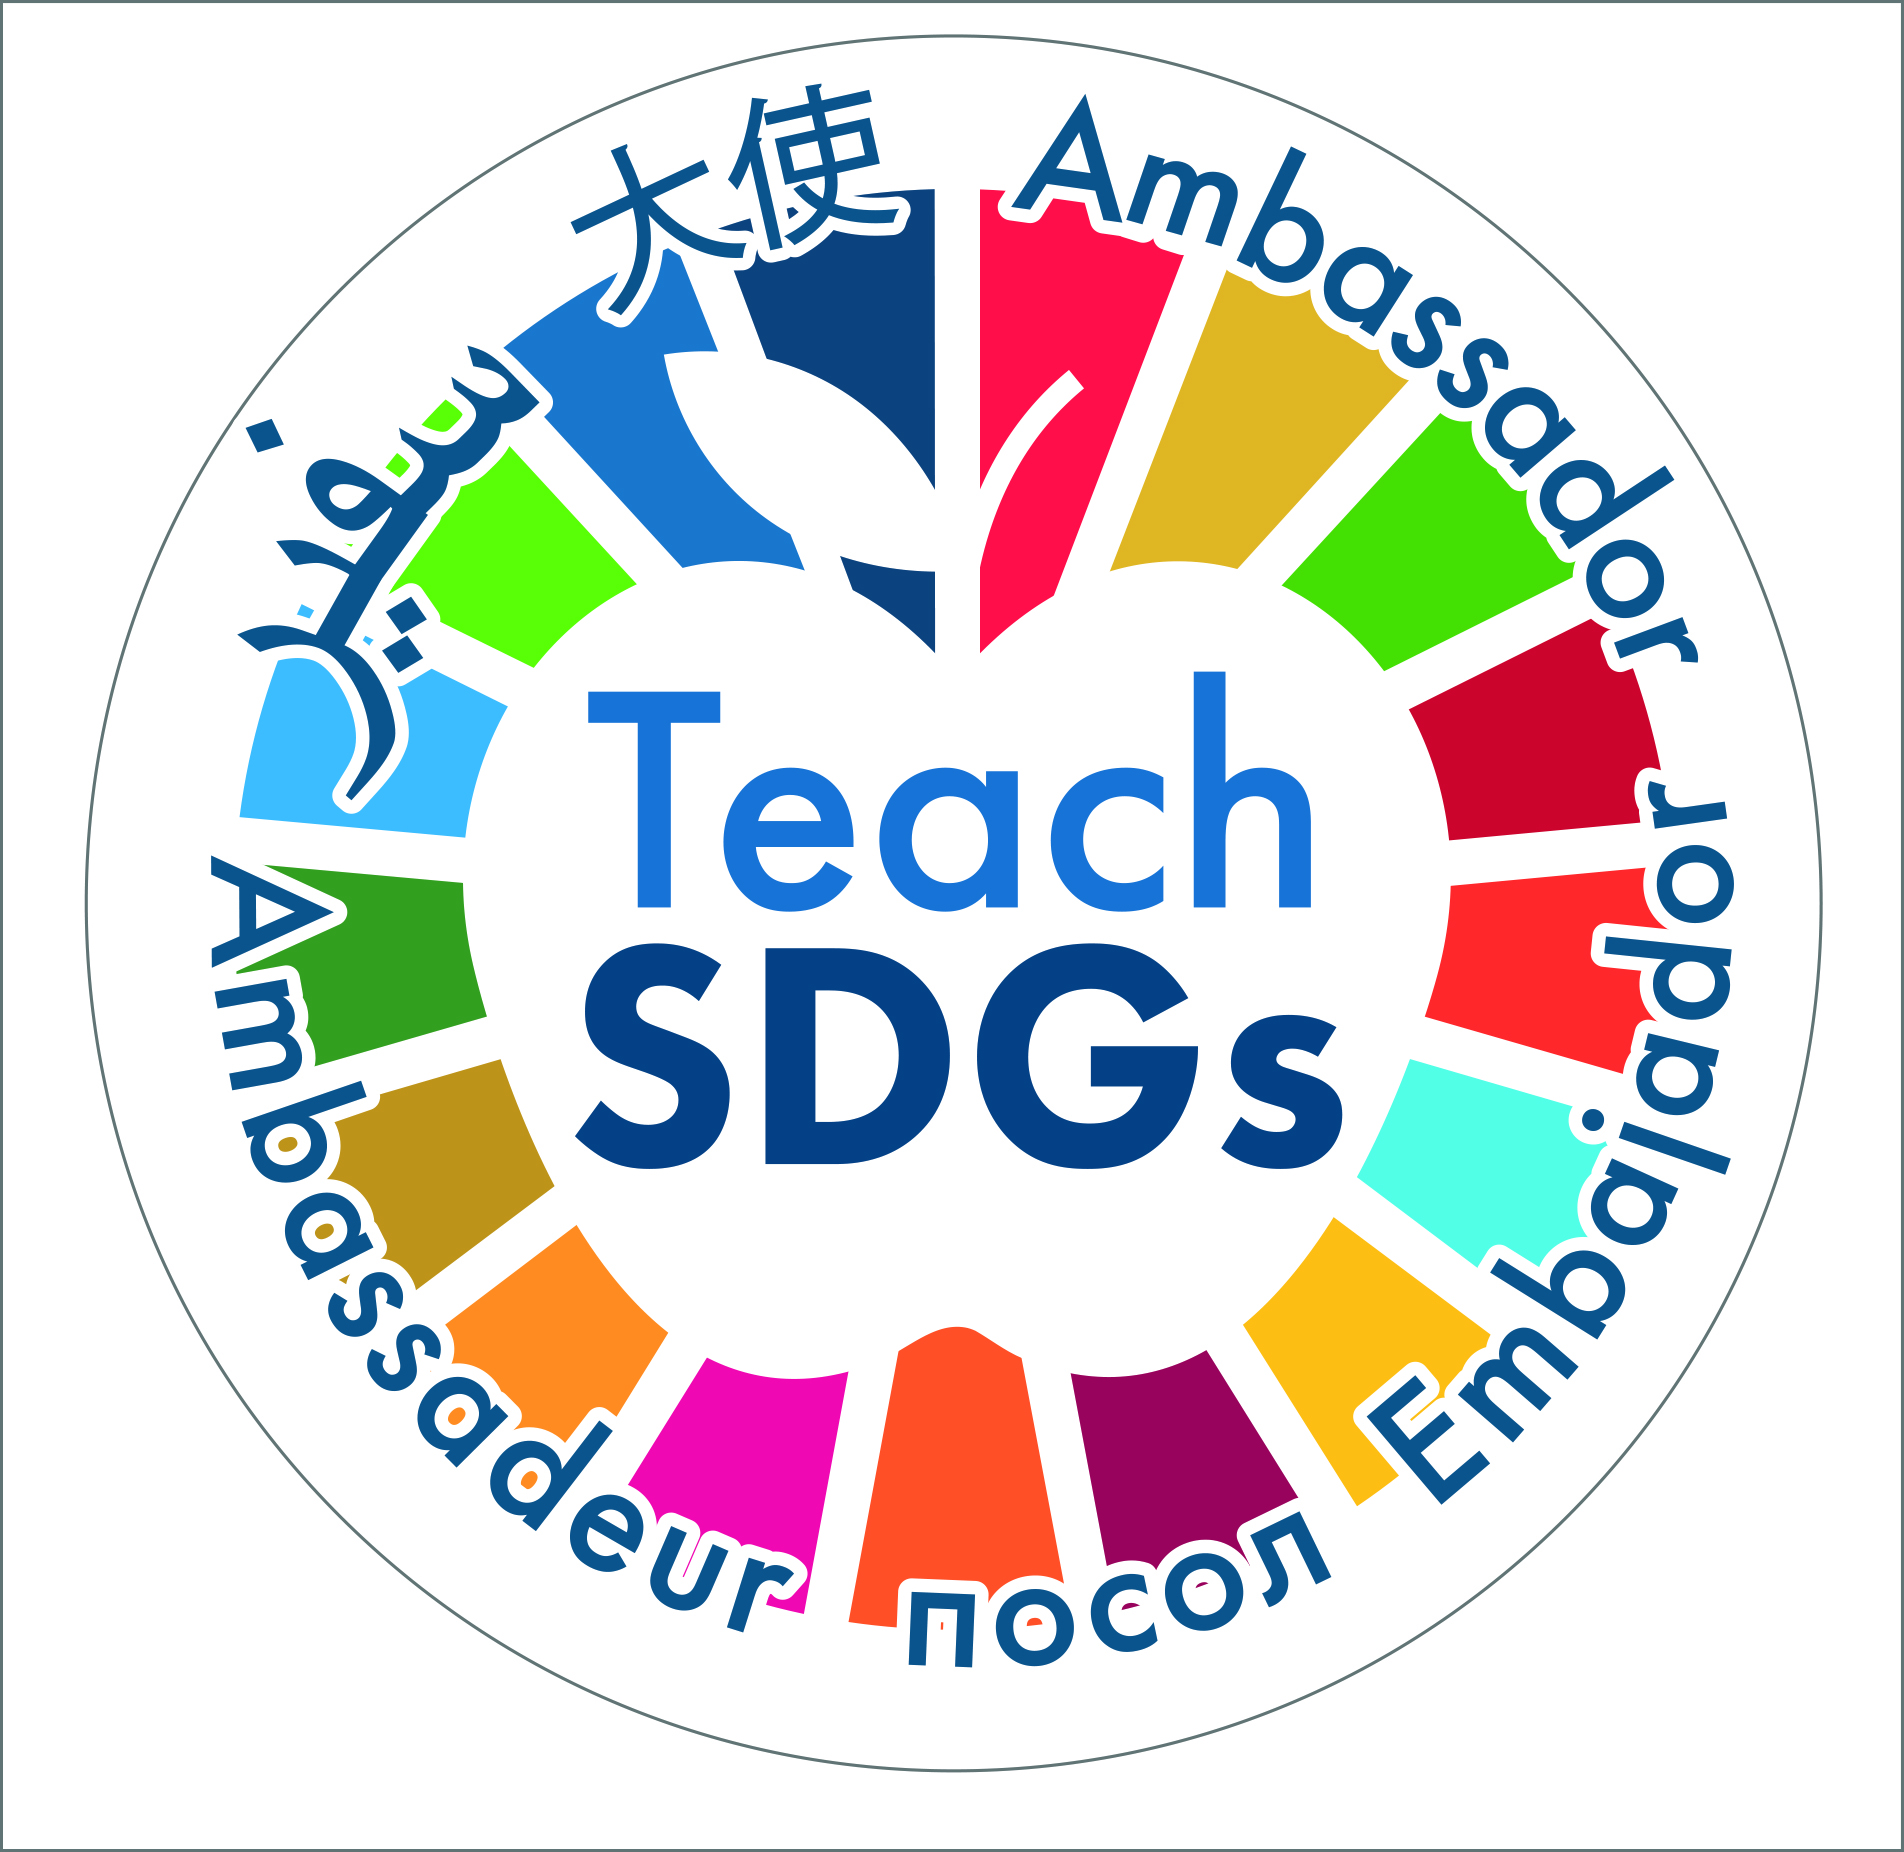 Teach SDGs Ambassador badge